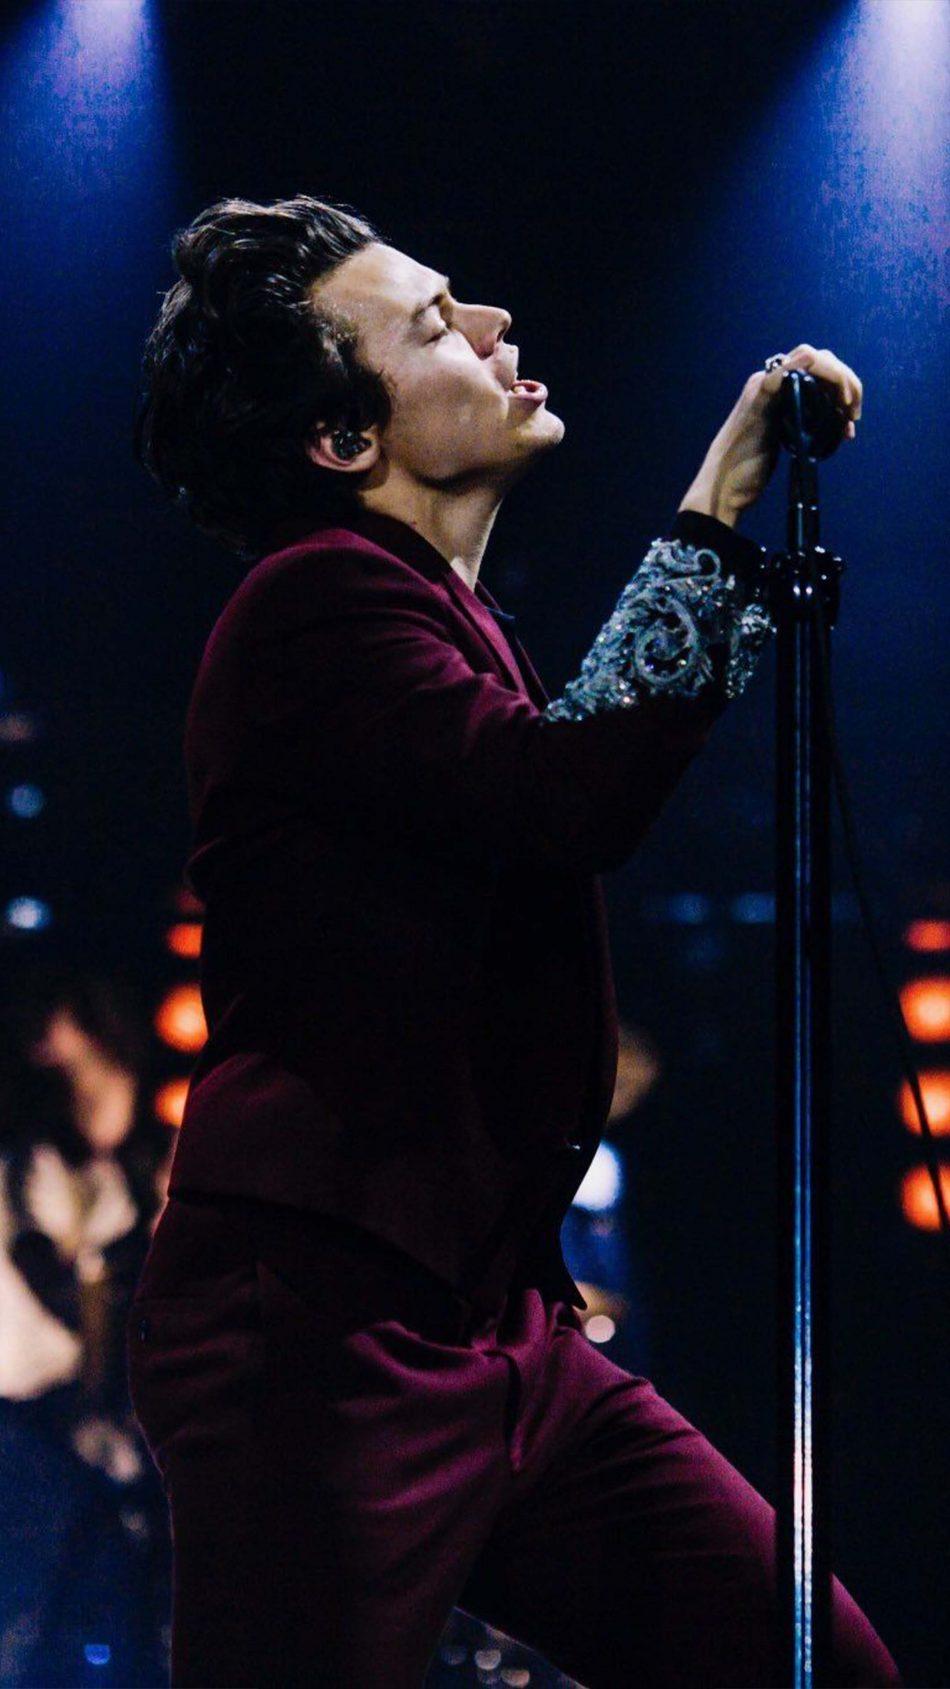 Harry Styles In Live Concert 4K Ultra HD Mobile Wallpaper